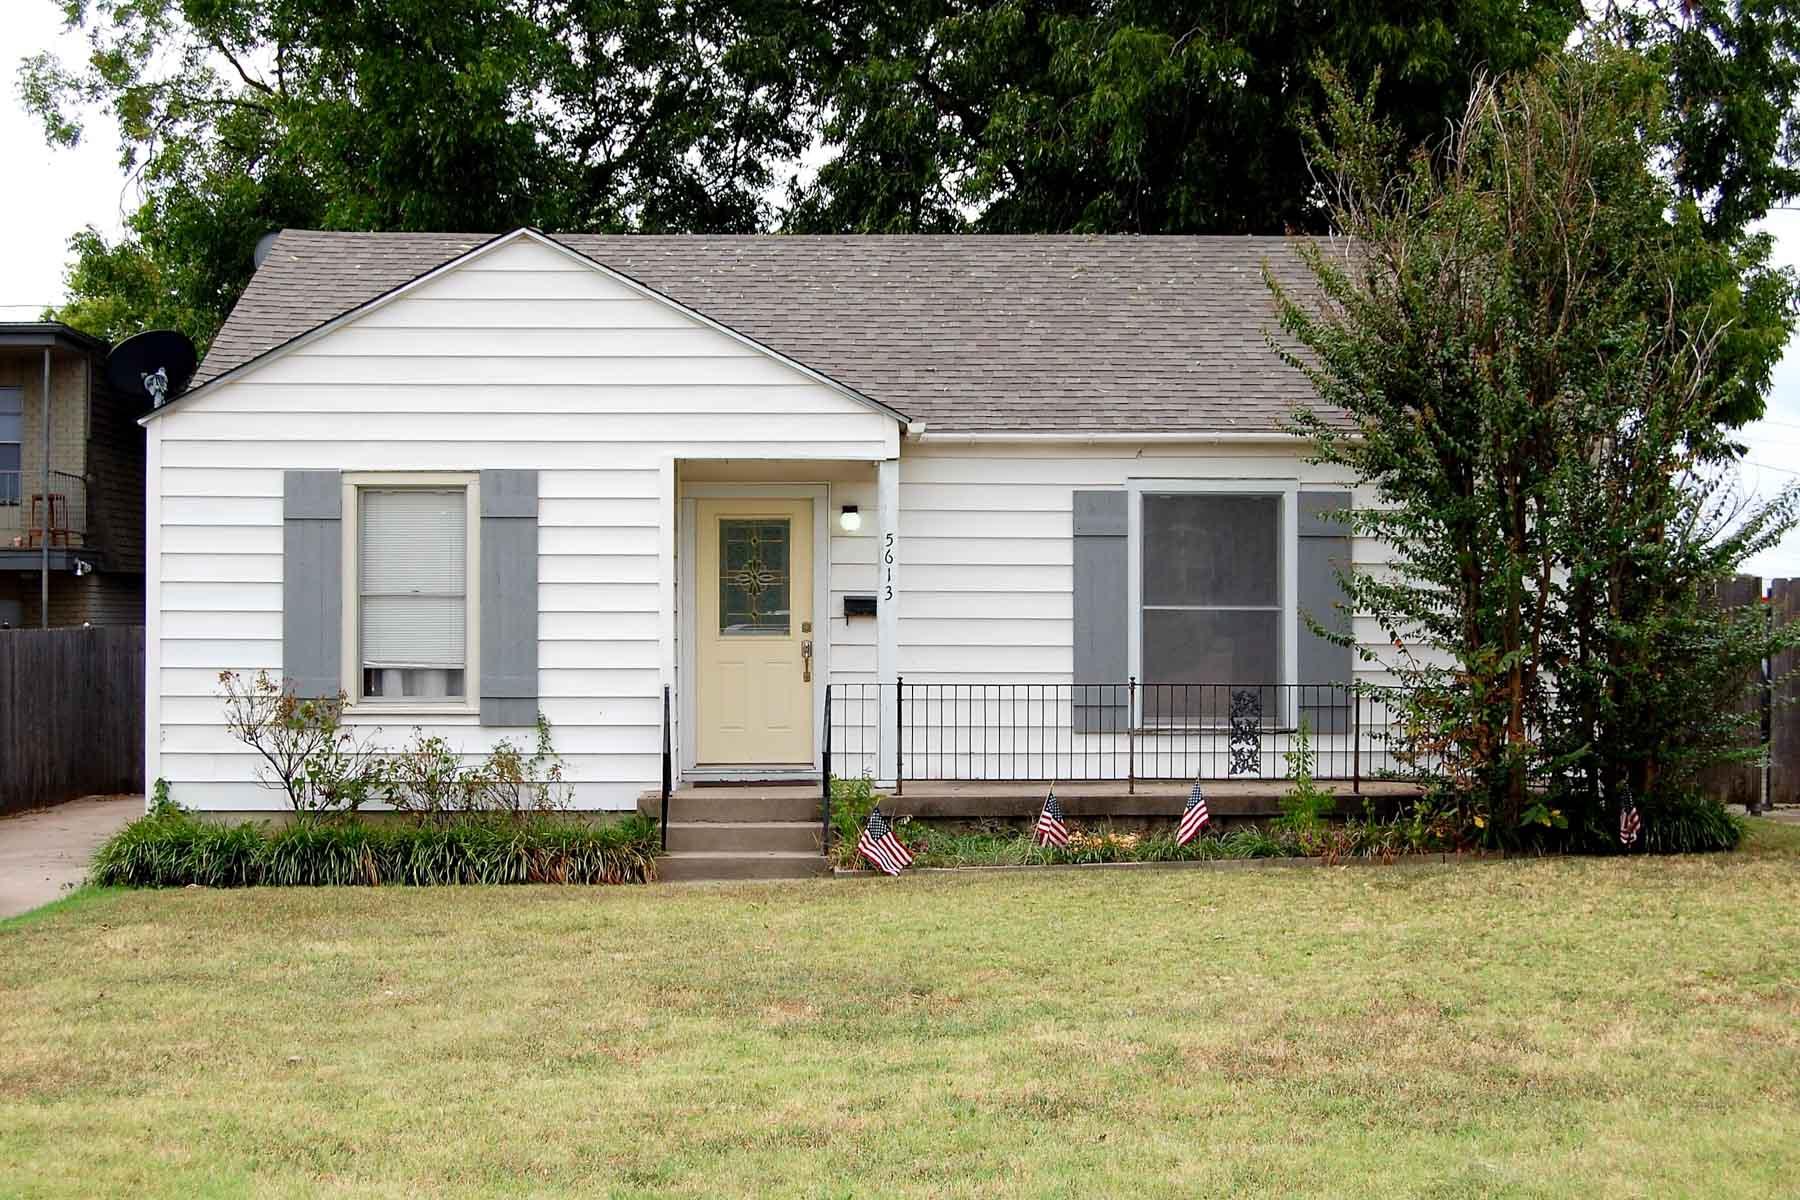 Moradia para Venda às Charming Cottage in Arlington Heights 5613 Birchman Ave. Fort Worth, Texas, 76107 Estados Unidos